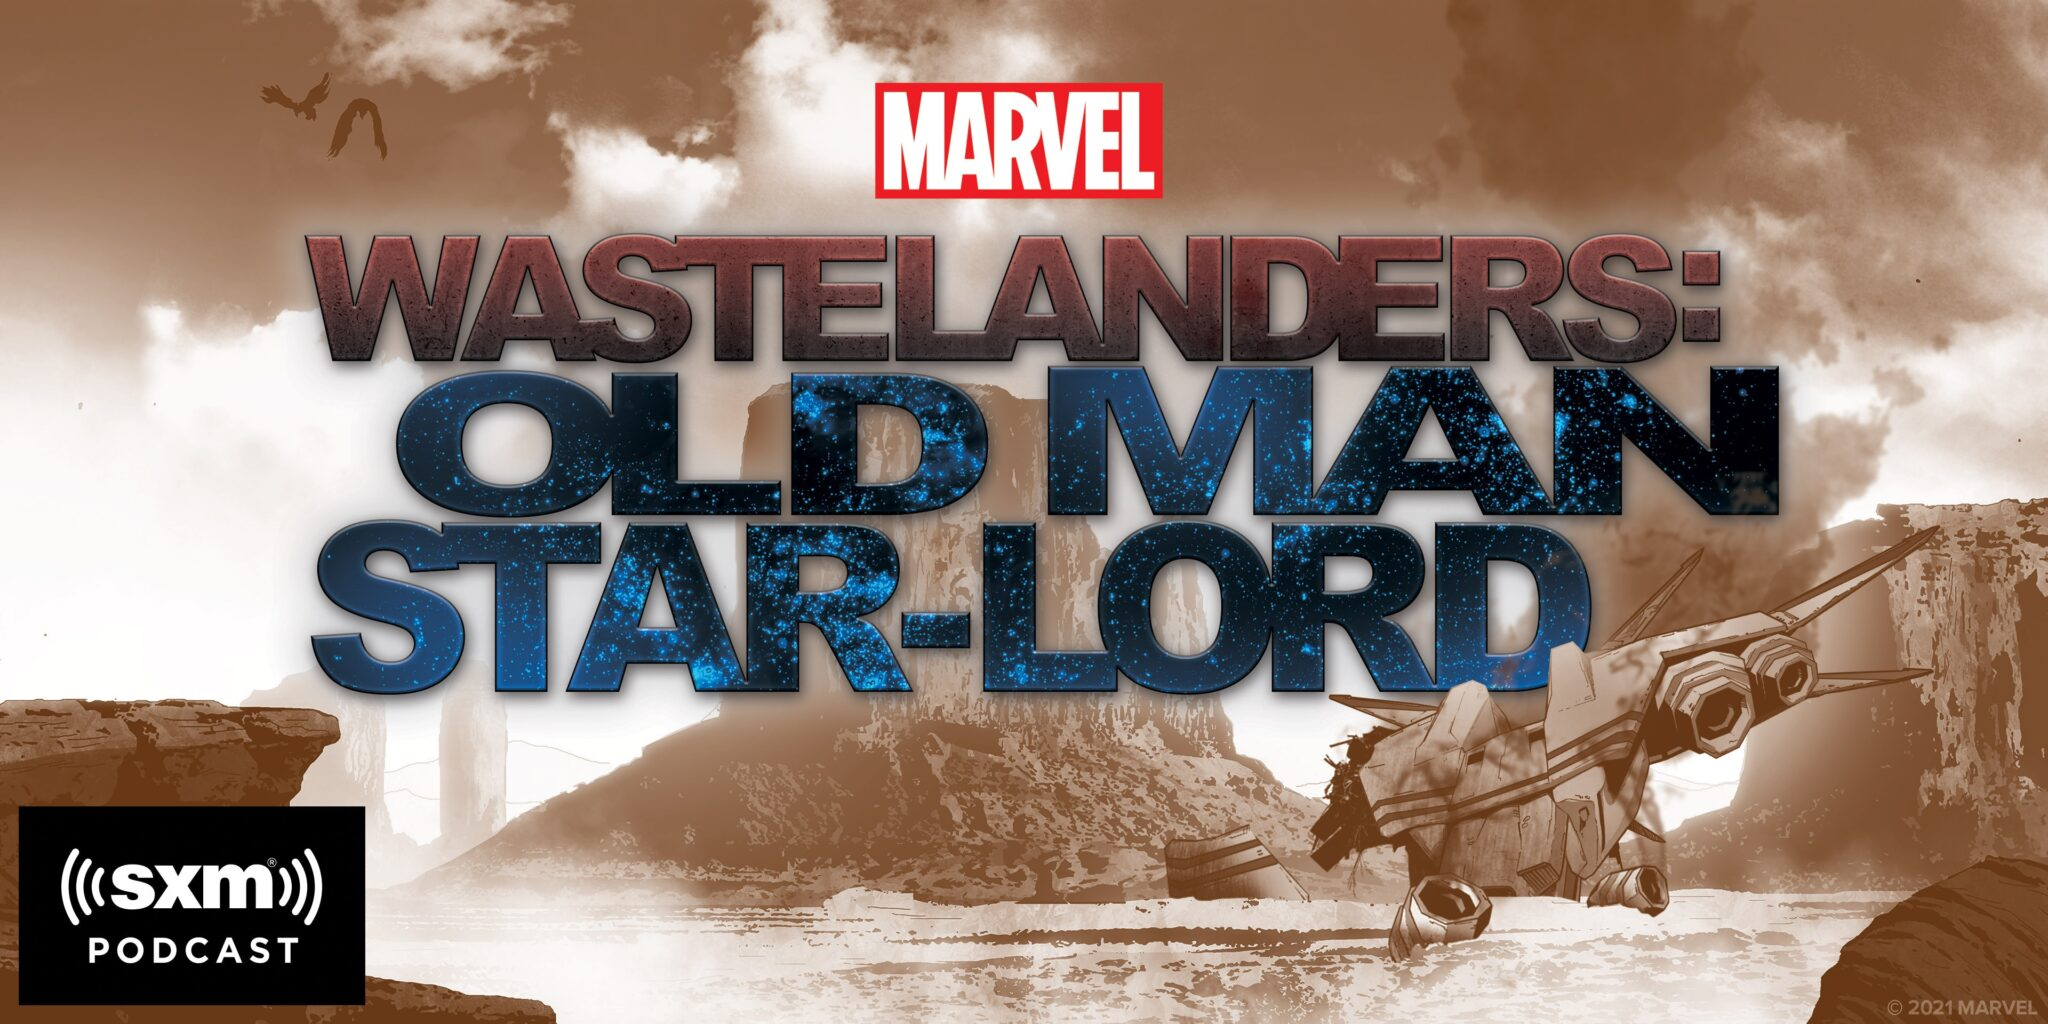 Marvel - Marvel's Wastelanders: Old Man Star-Lord